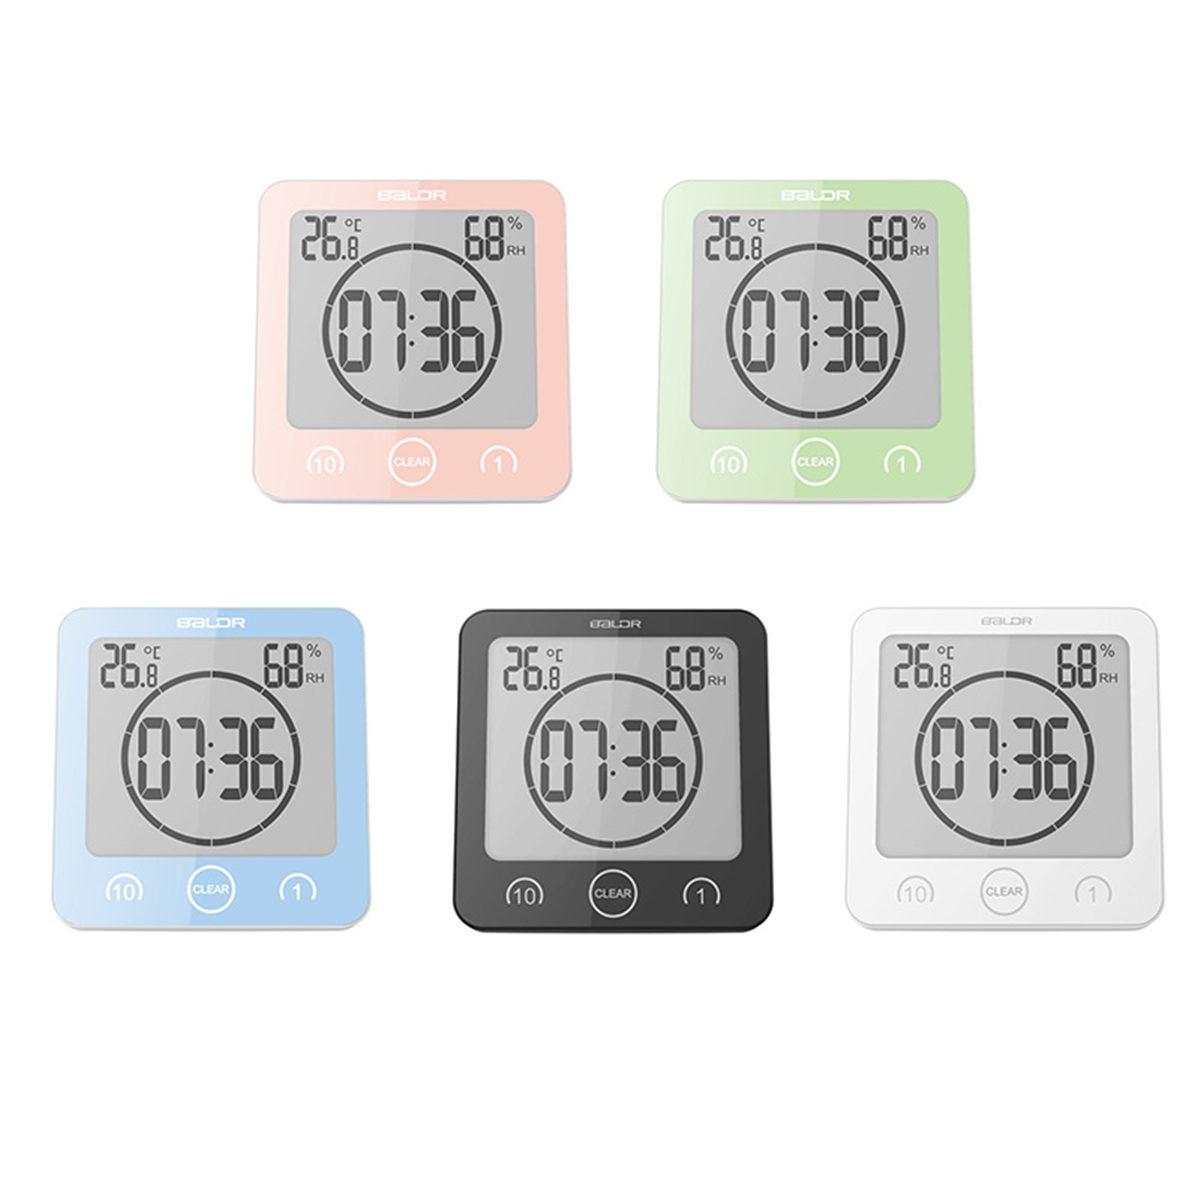 LCD Screen Waterproof Digital Bathroom Wall Clock Temperature Humidity Countdown Time Function Wash Shower Hanging Clocks Timer